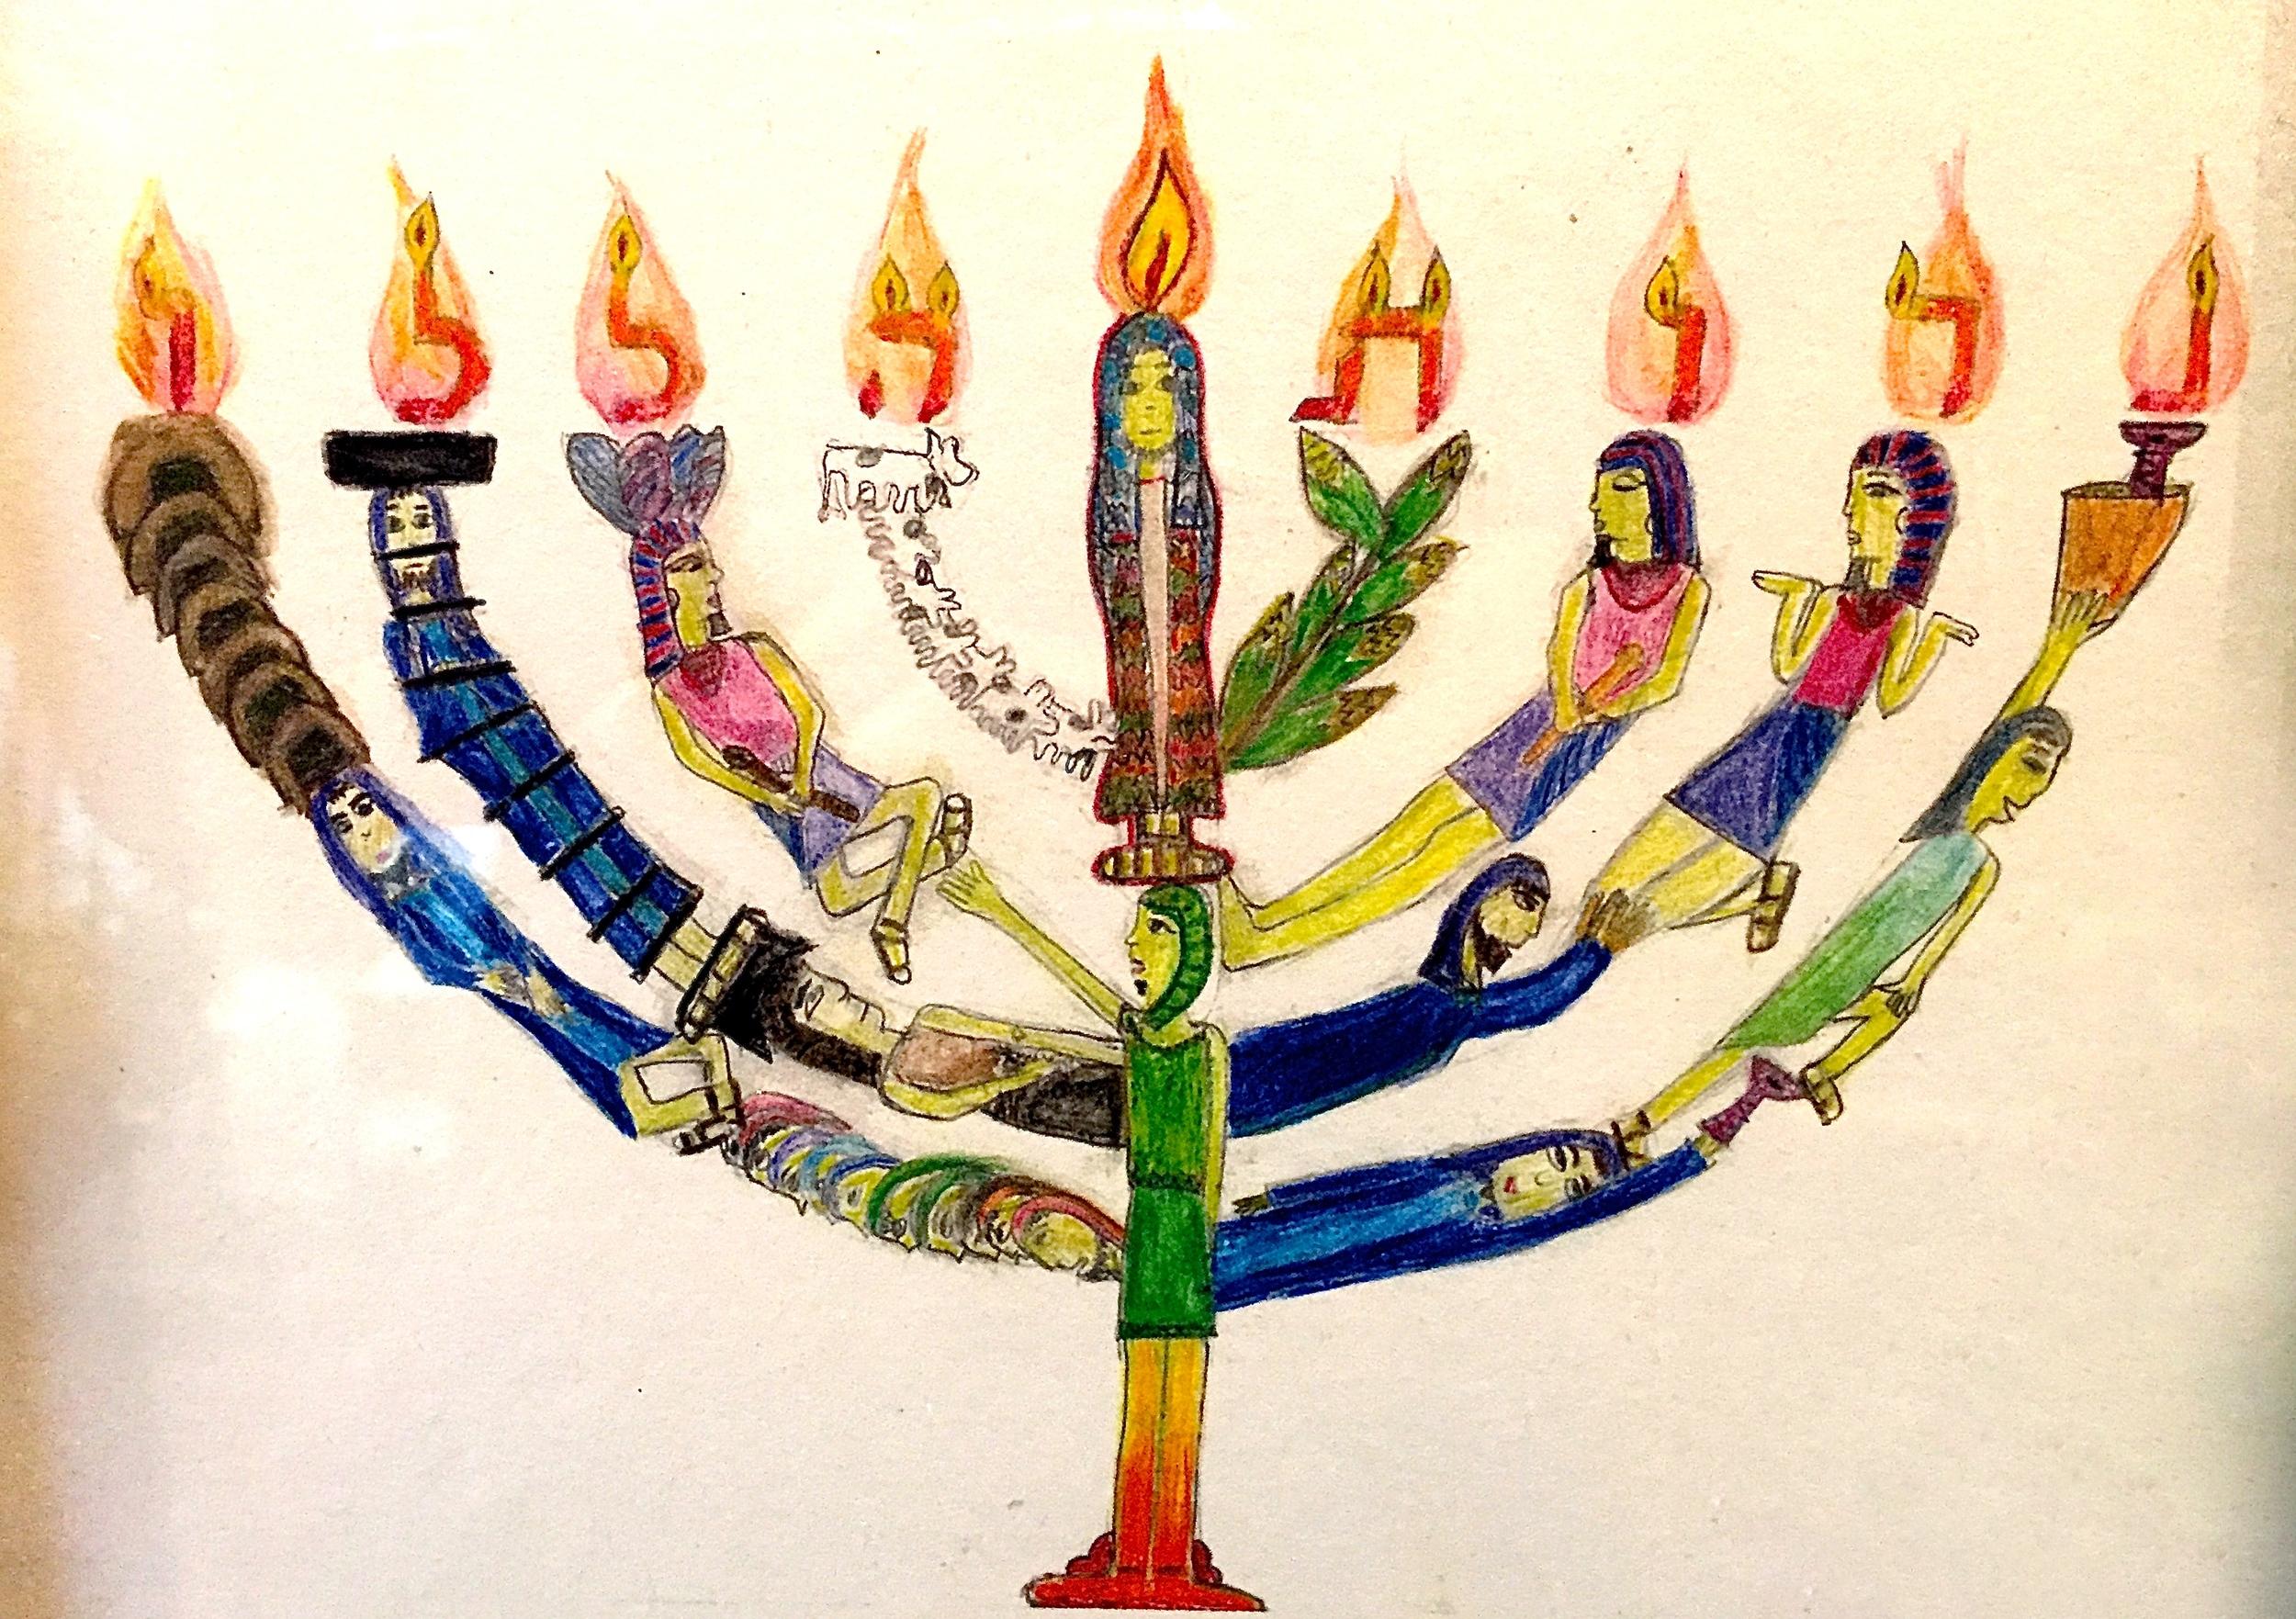 The card I designed for my bat mitzvah invitation - Joseph's story woven into the hanukkiyah